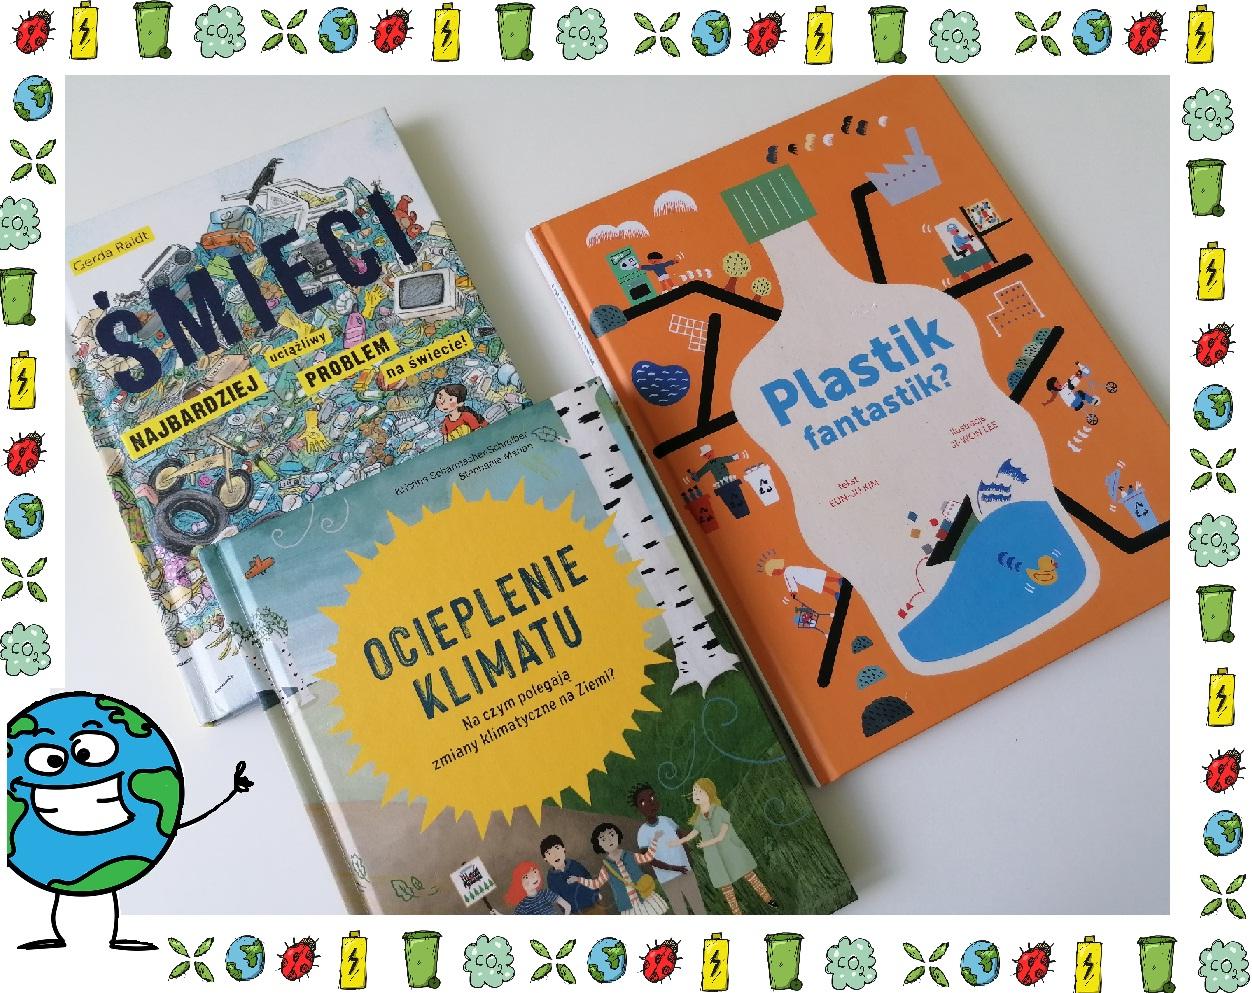 książki, klimat, śmieci, plastik fantasitik